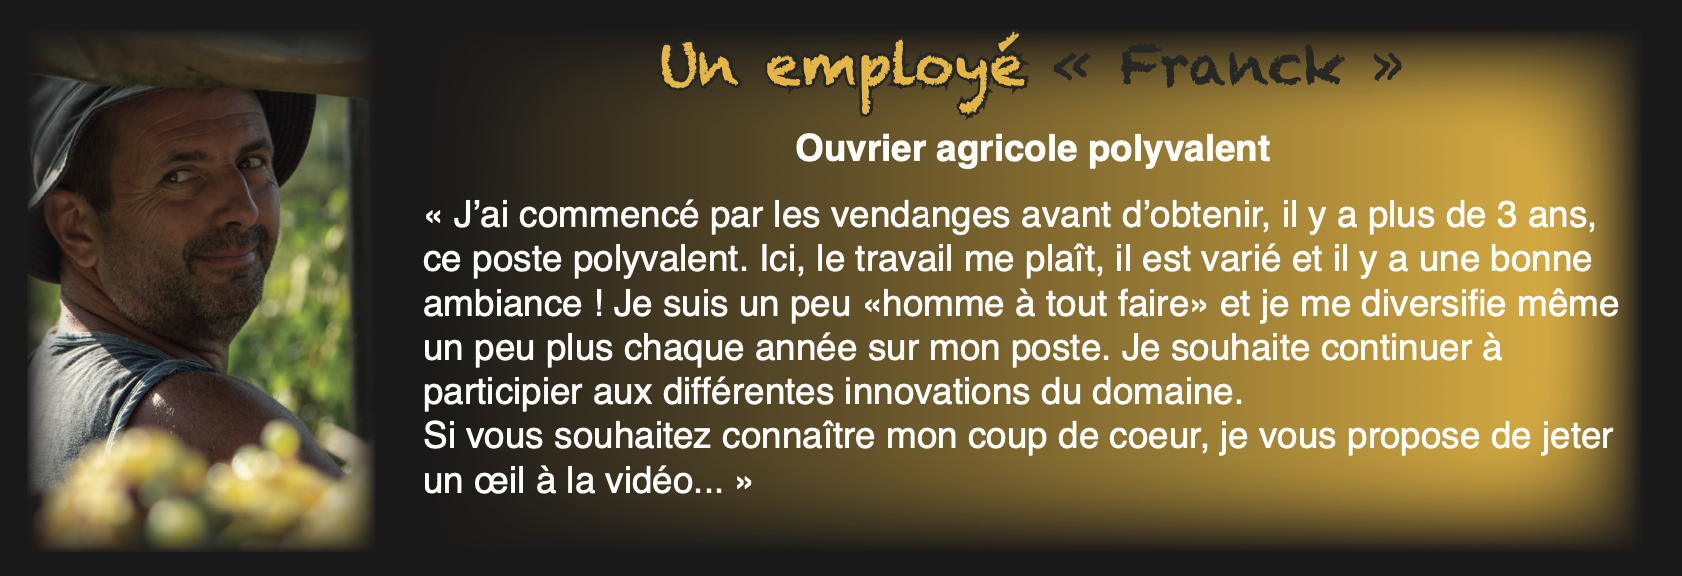 Franck – ouvrier agricole polyvalent